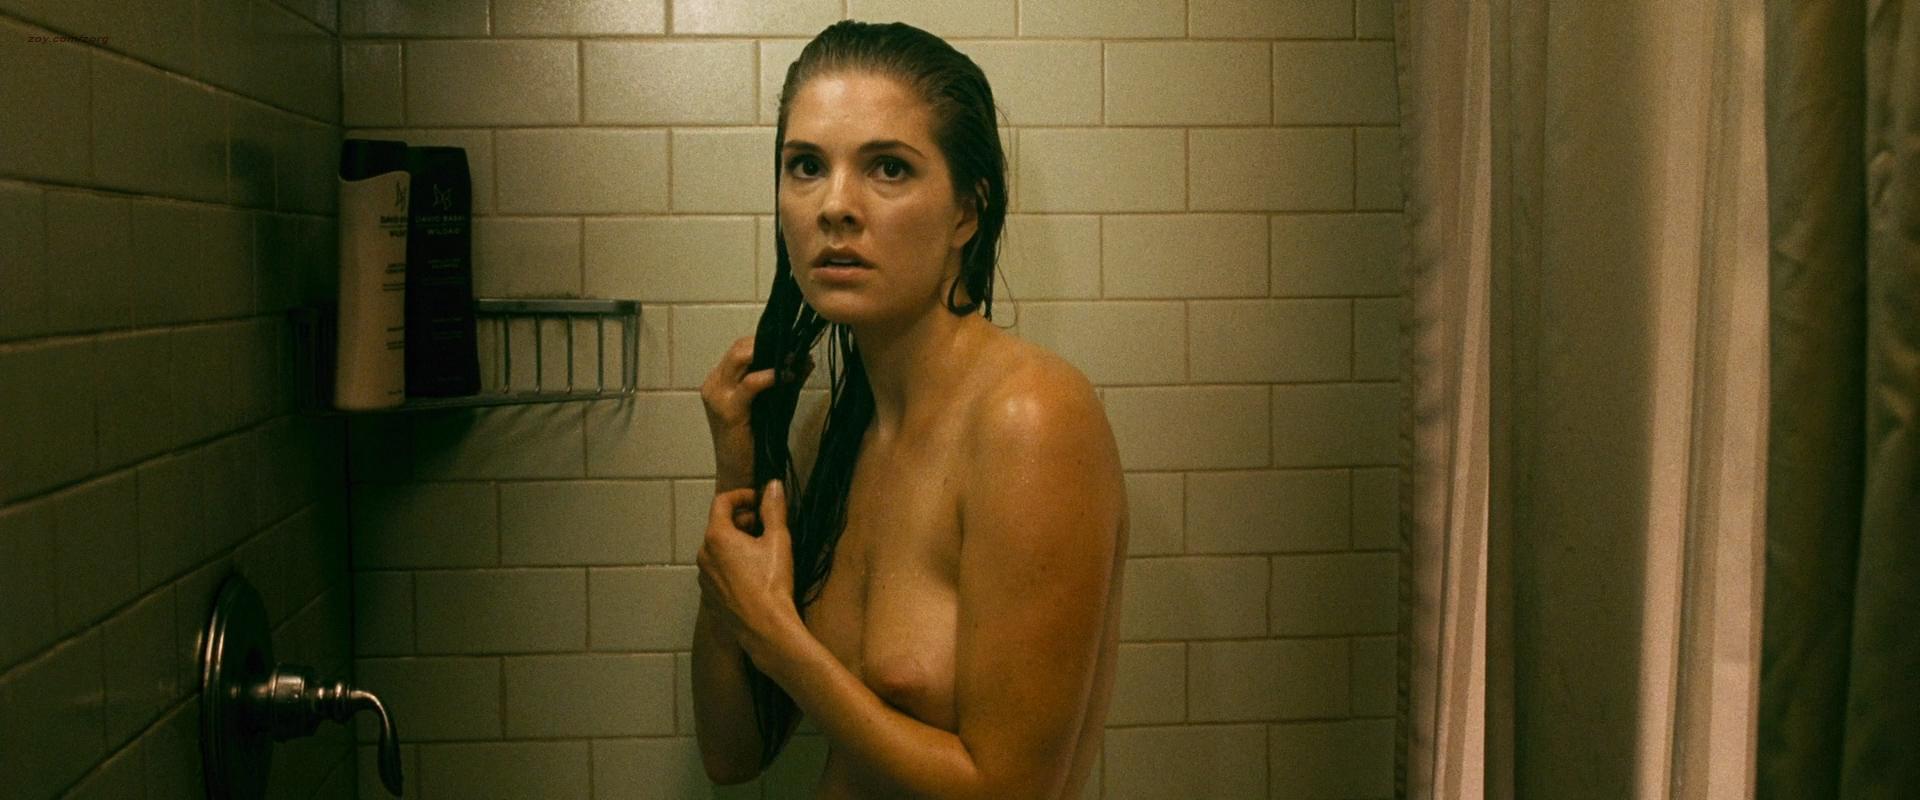 jamie nicole anderson nude pics